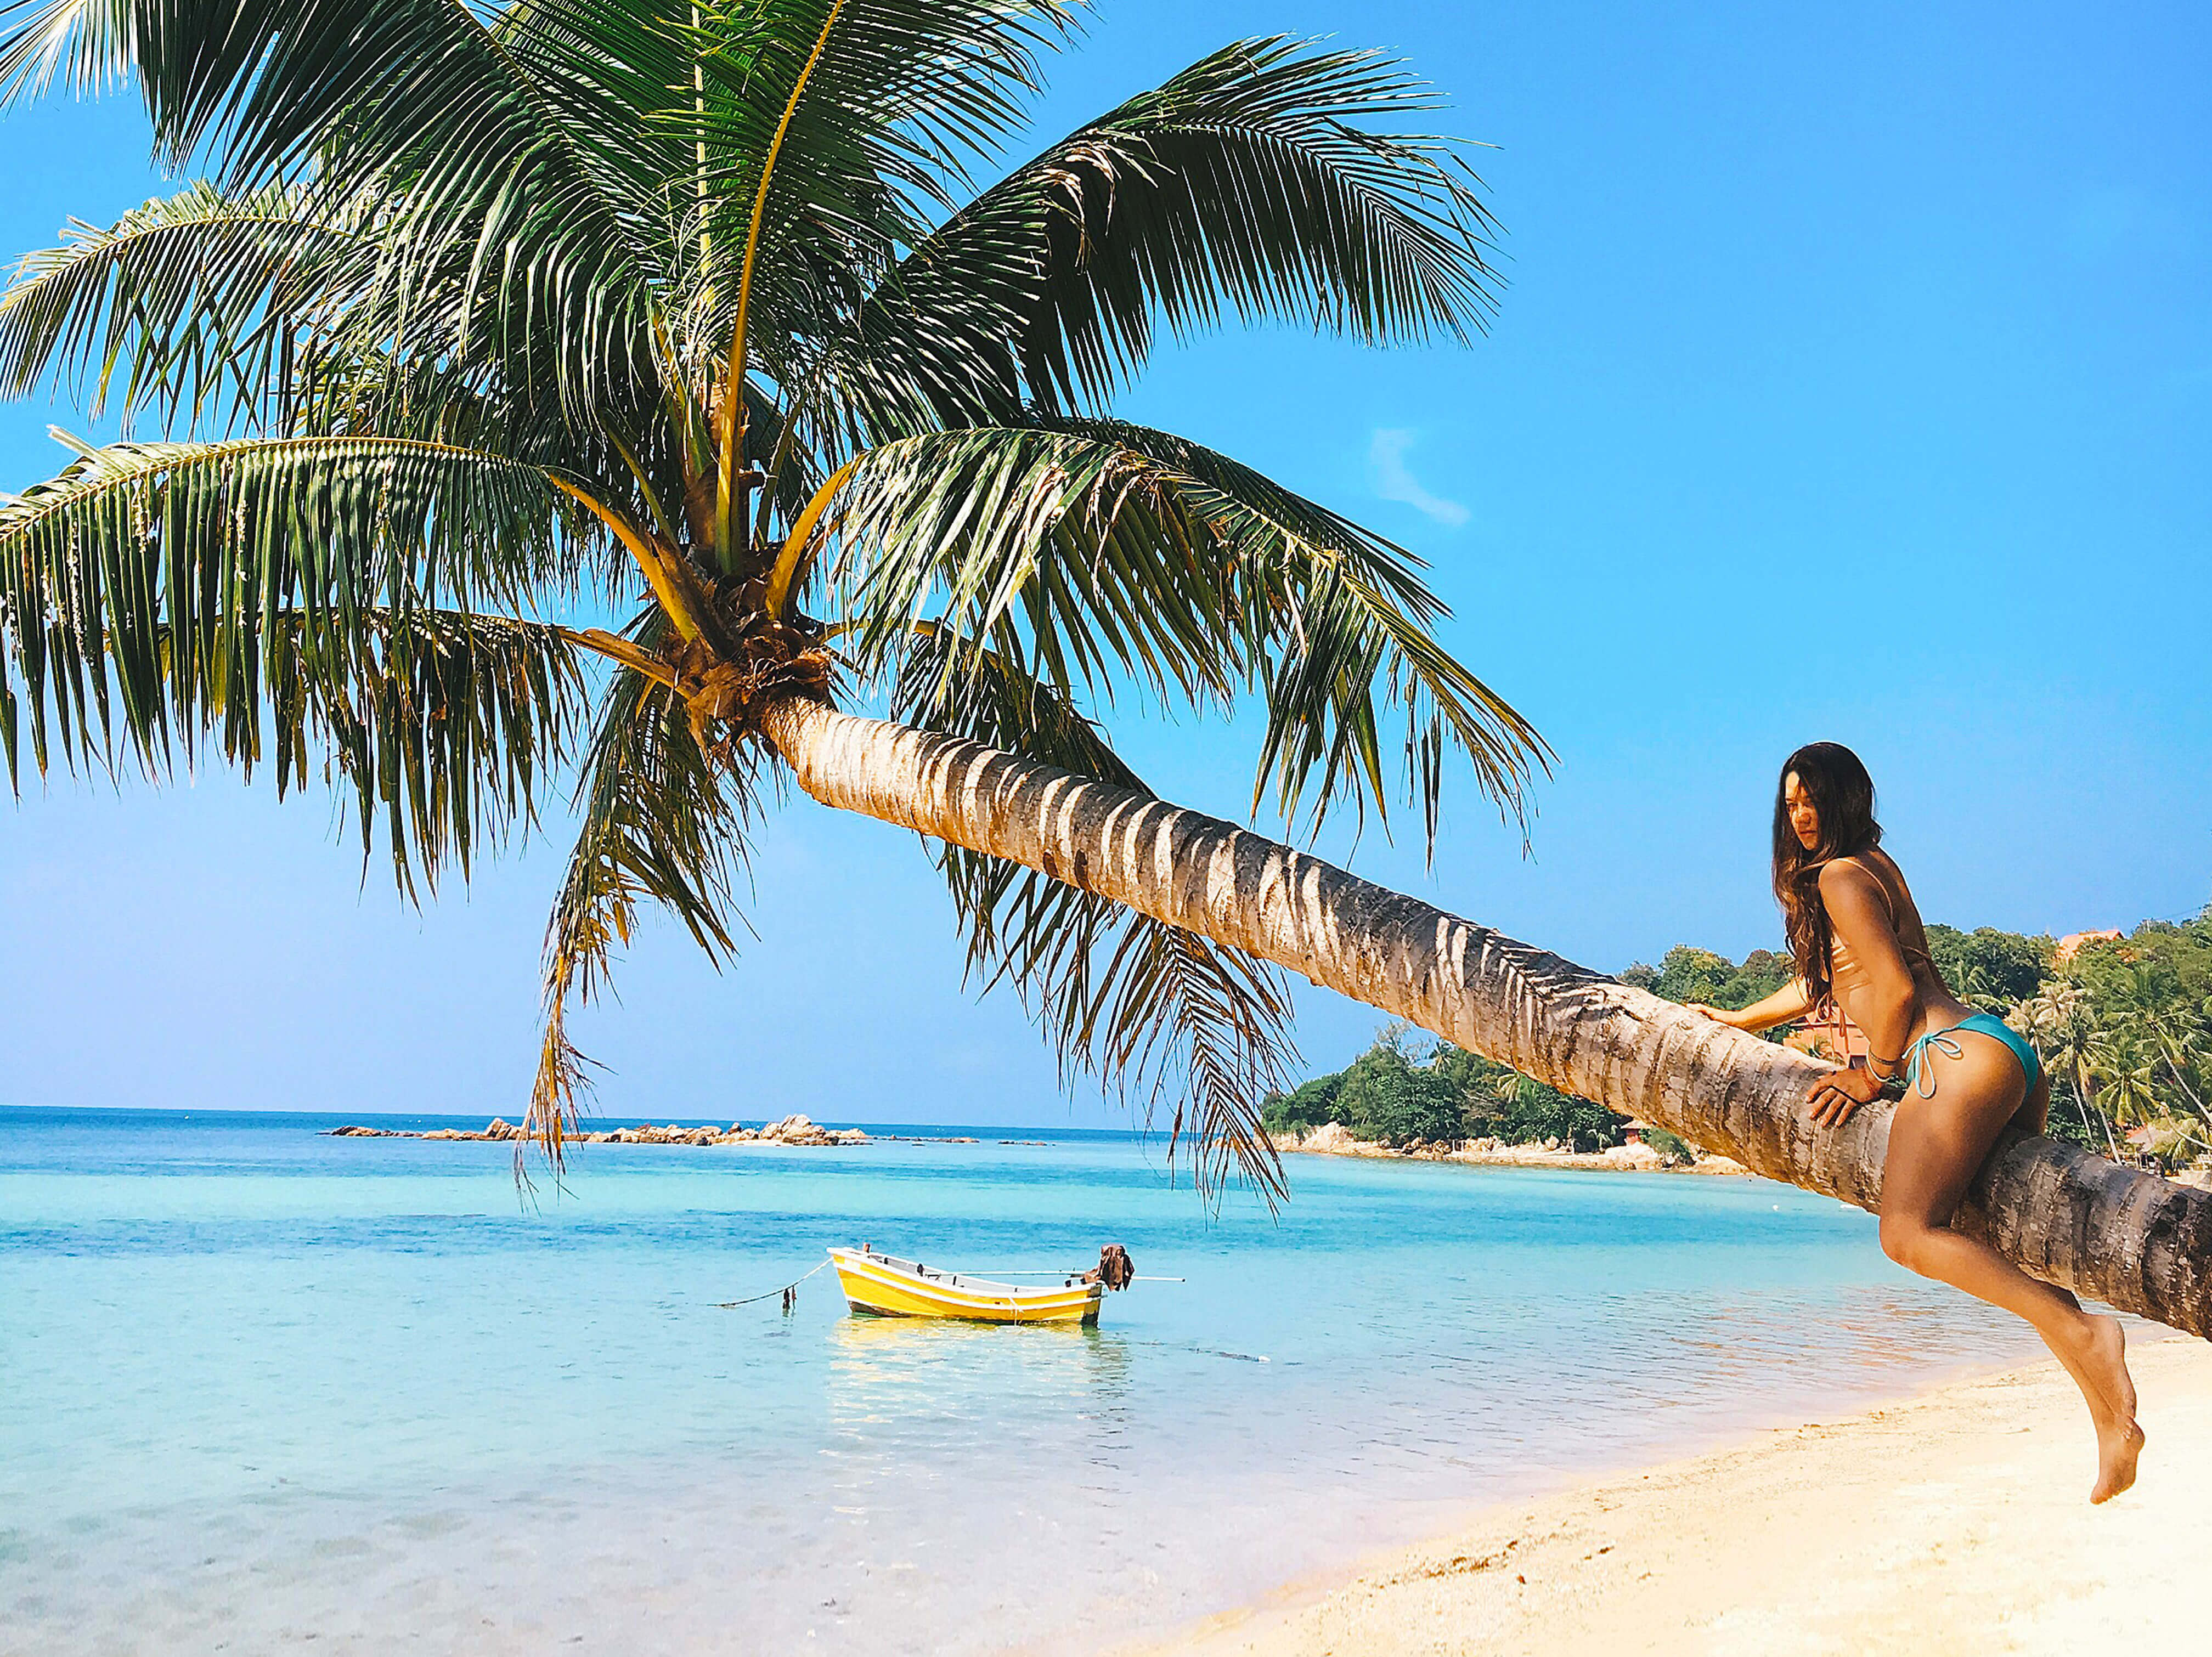 Thailand, Phangan, island, beach, palmtree, sea, Таиланд, Панган, остров, пляж, пальма, море